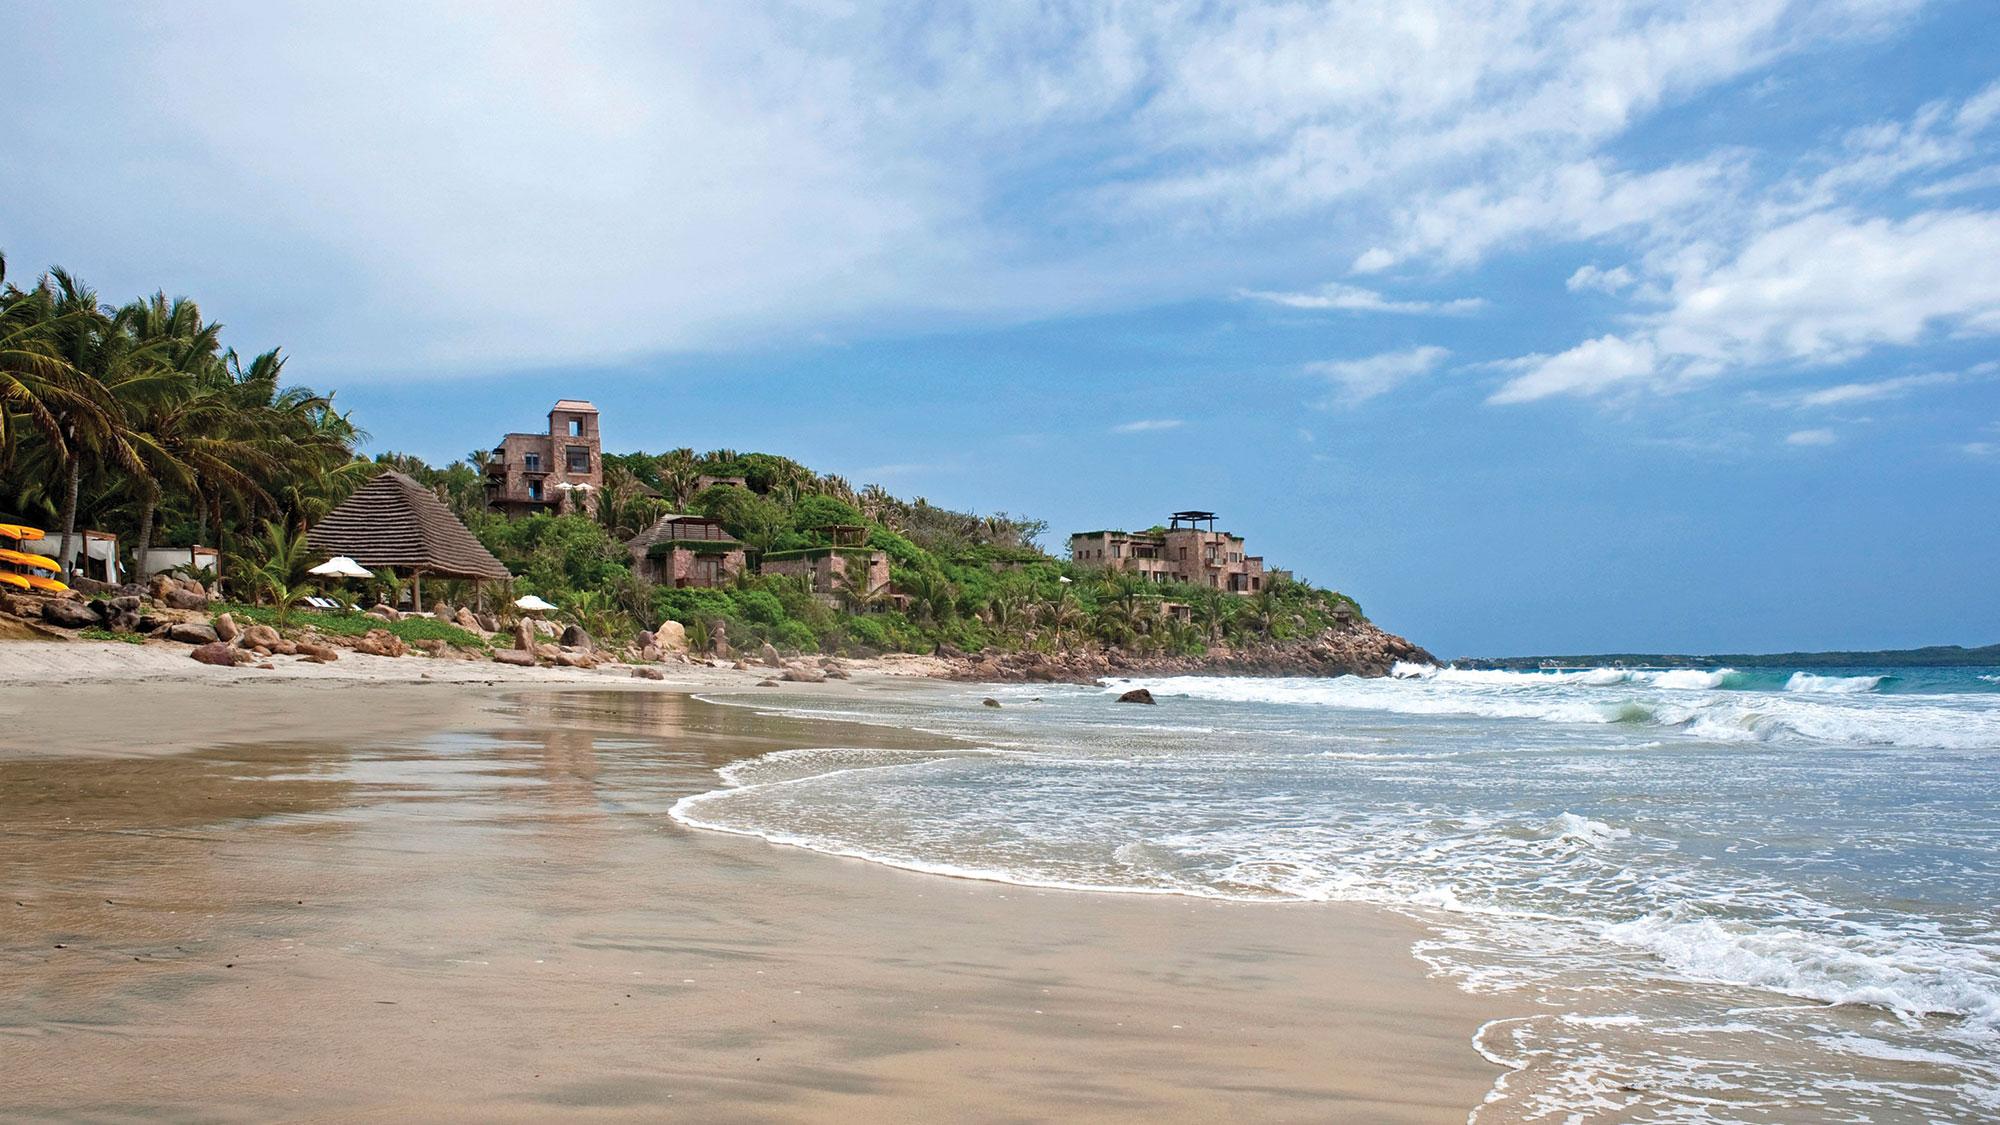 The Playa Hotel Imanta in Punta de Mita in Nayarit. Imanta Resorts are among those offering Covid testing on site.